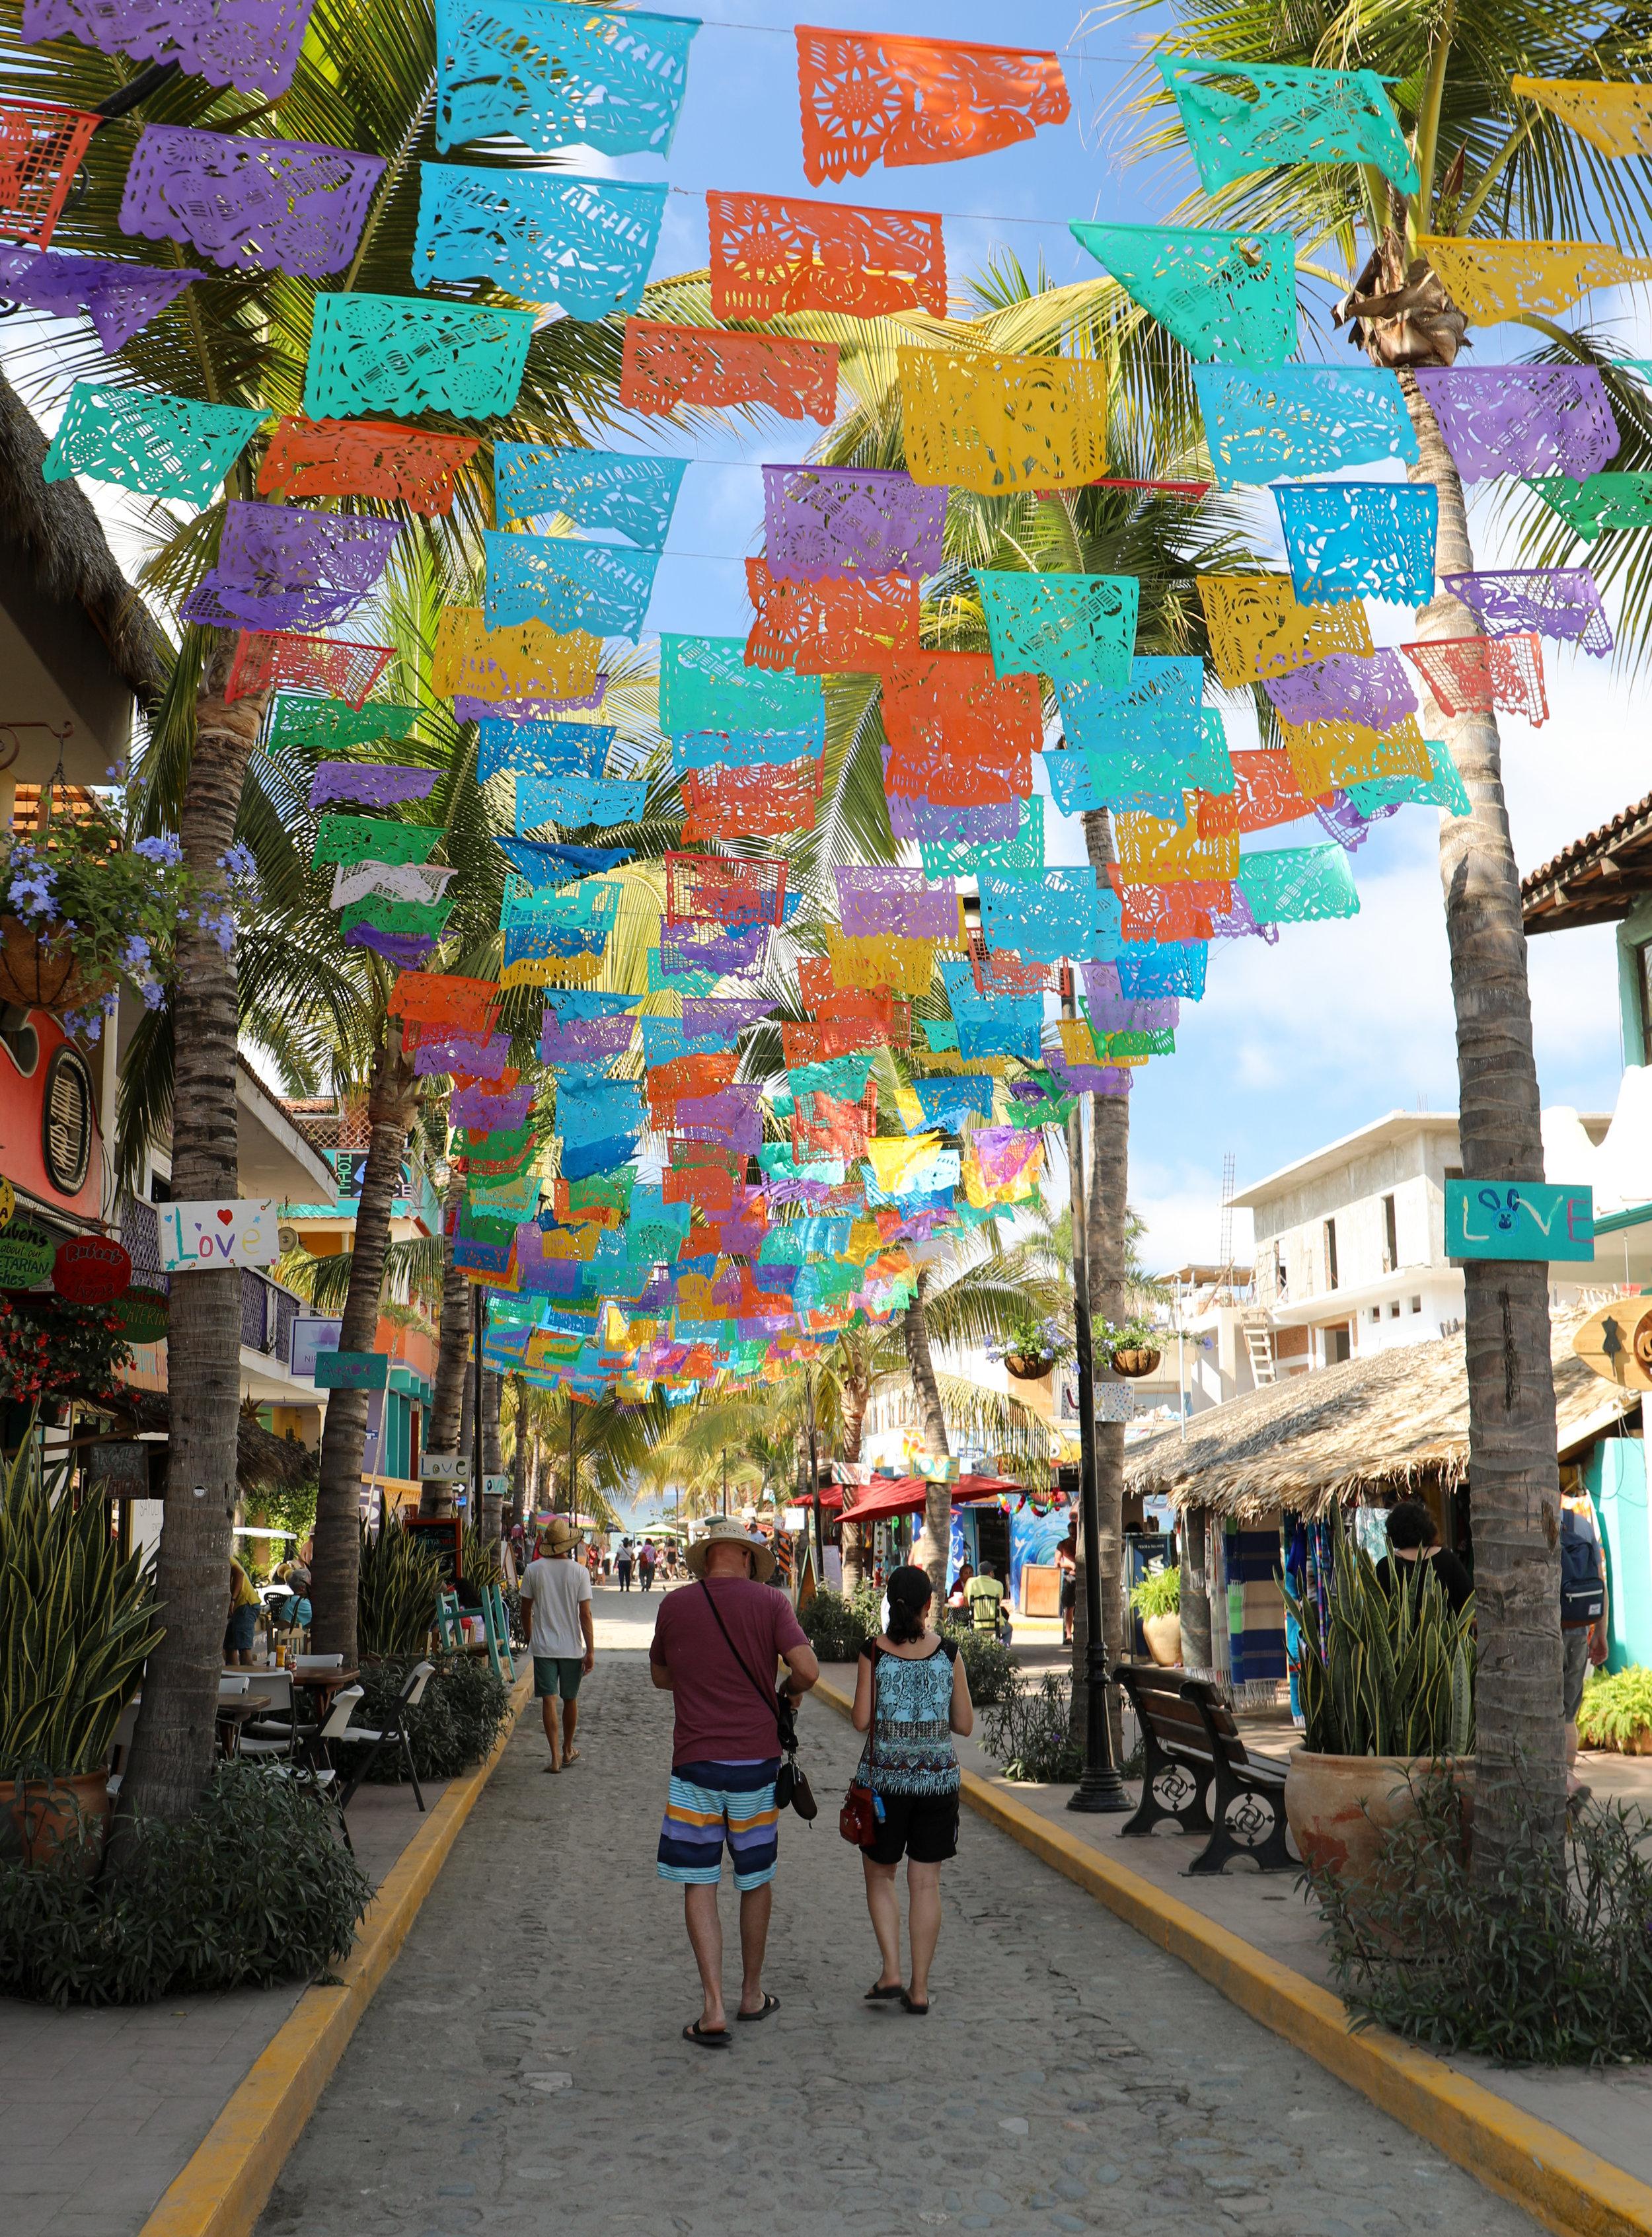 Wandering the colorful streets of Sayulita.